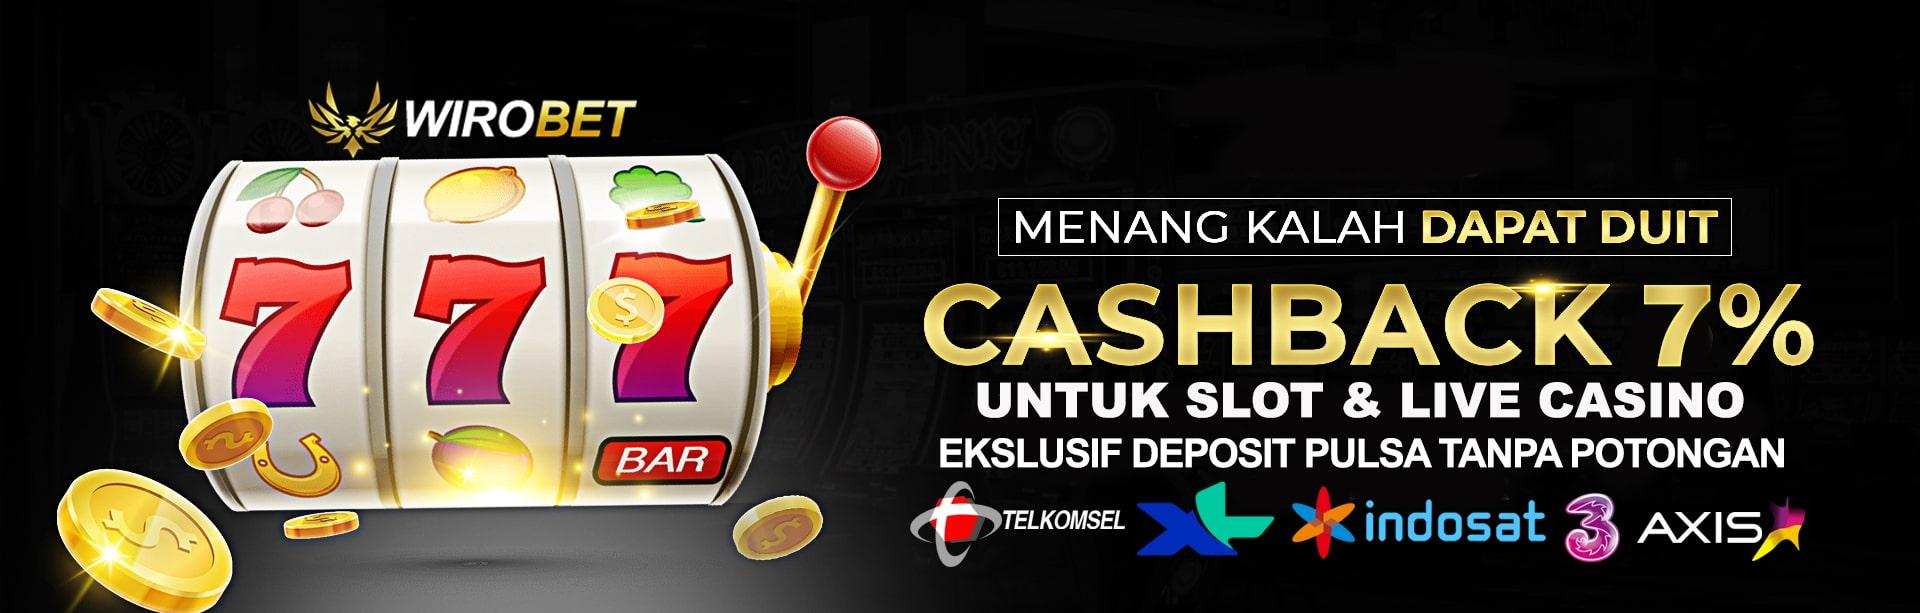 Cashback slot dan live casino